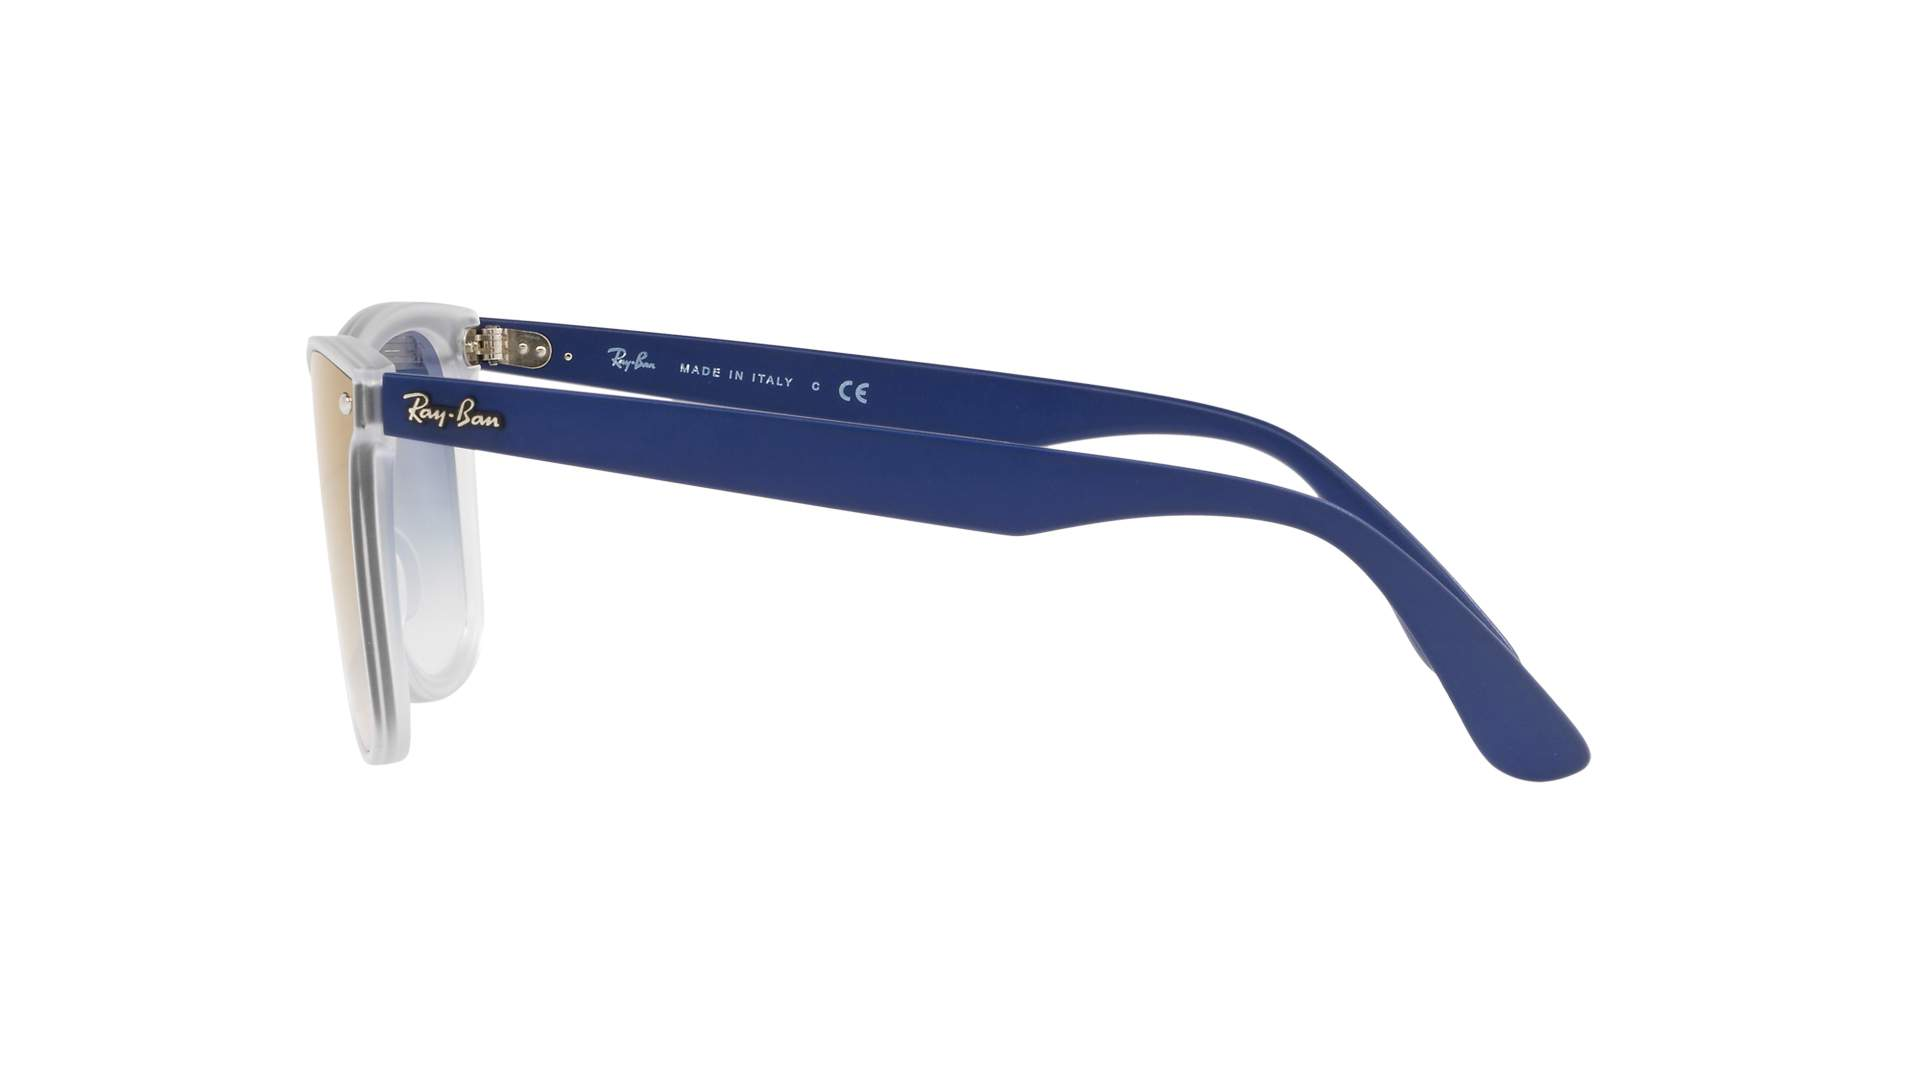 86865b0cf6b Sunglasses Ray-Ban Wayfarer Blaze Blue RB4440N 6356 X0 41-18 Medium  Gradient Mirror